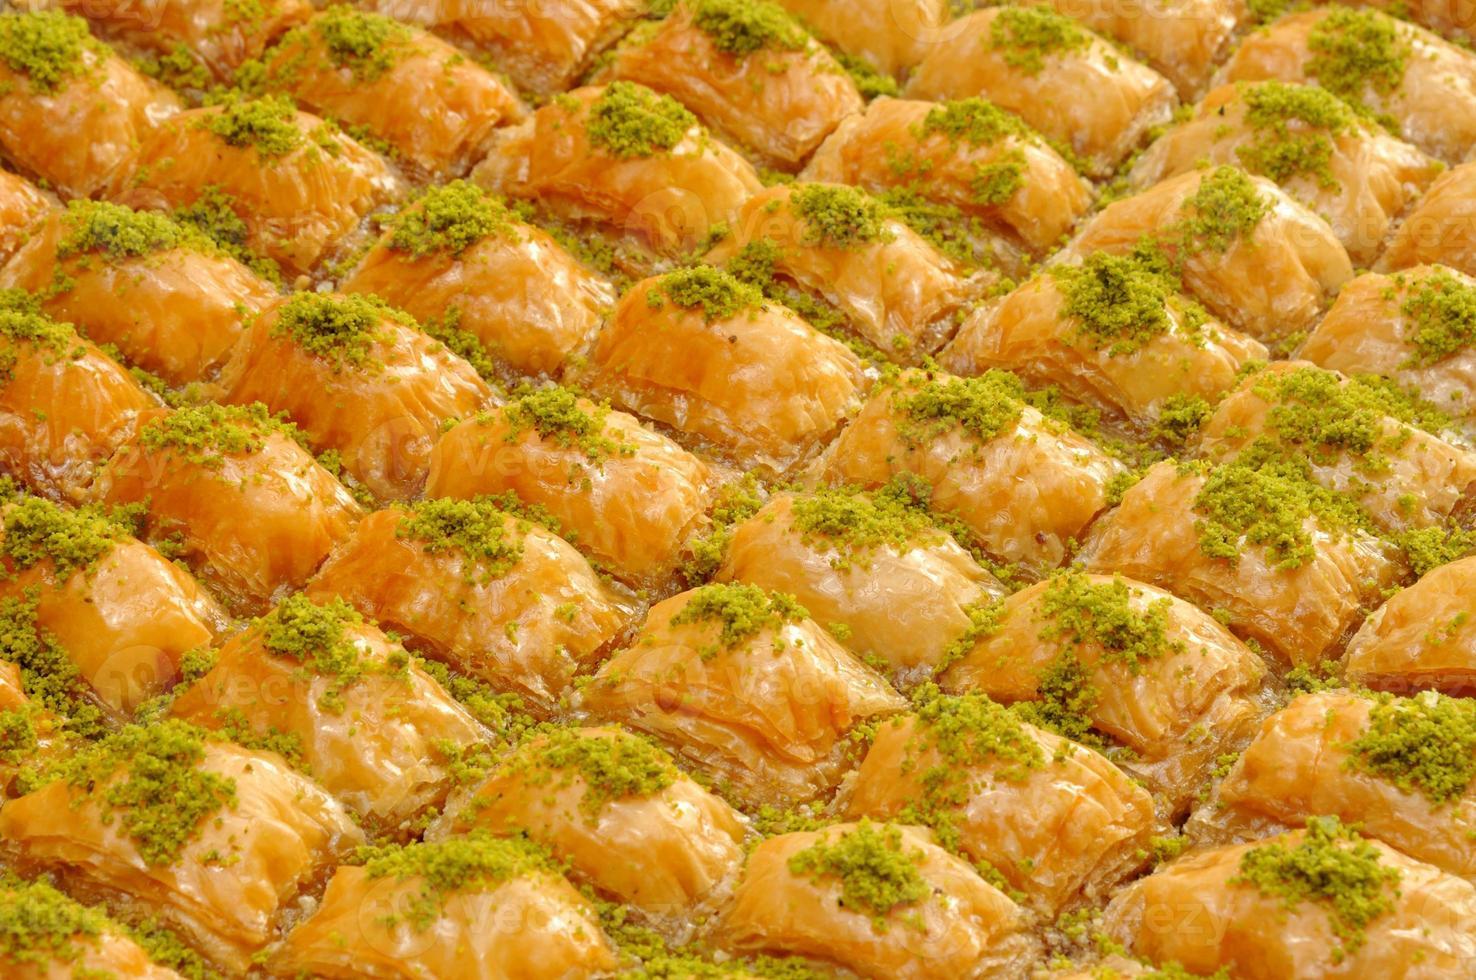 baklava dessert traditionnel photo